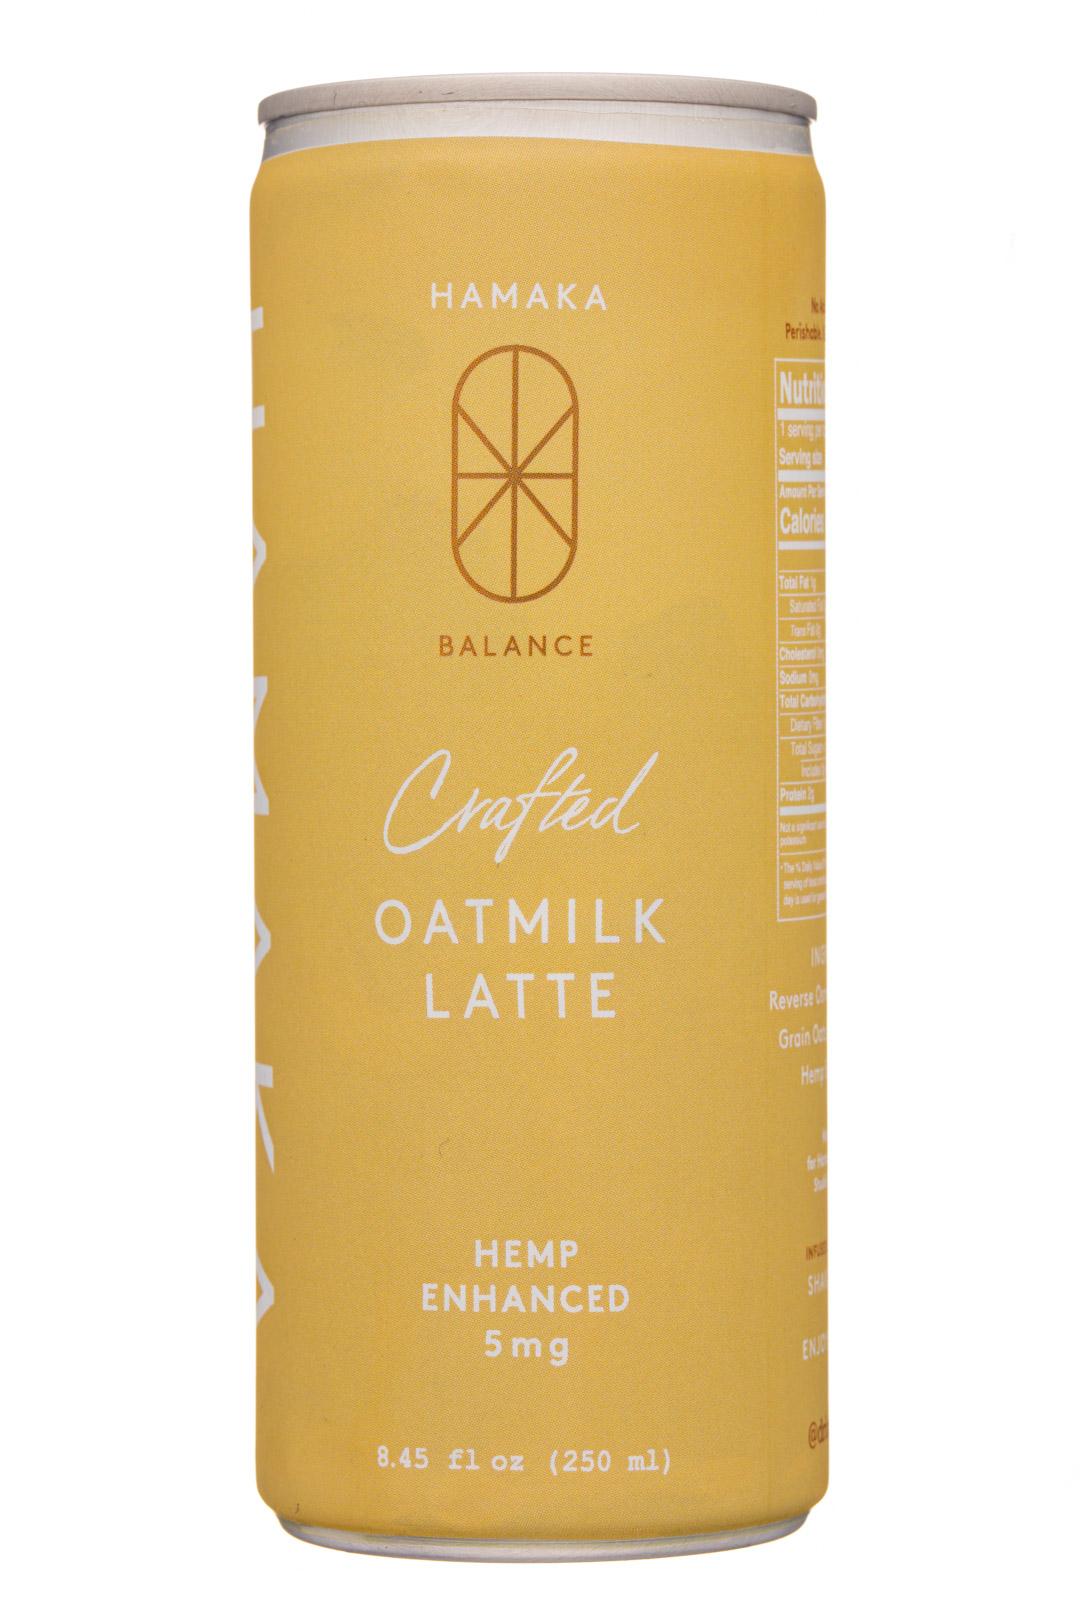 Hemp Enhanced Oatmilk Latte